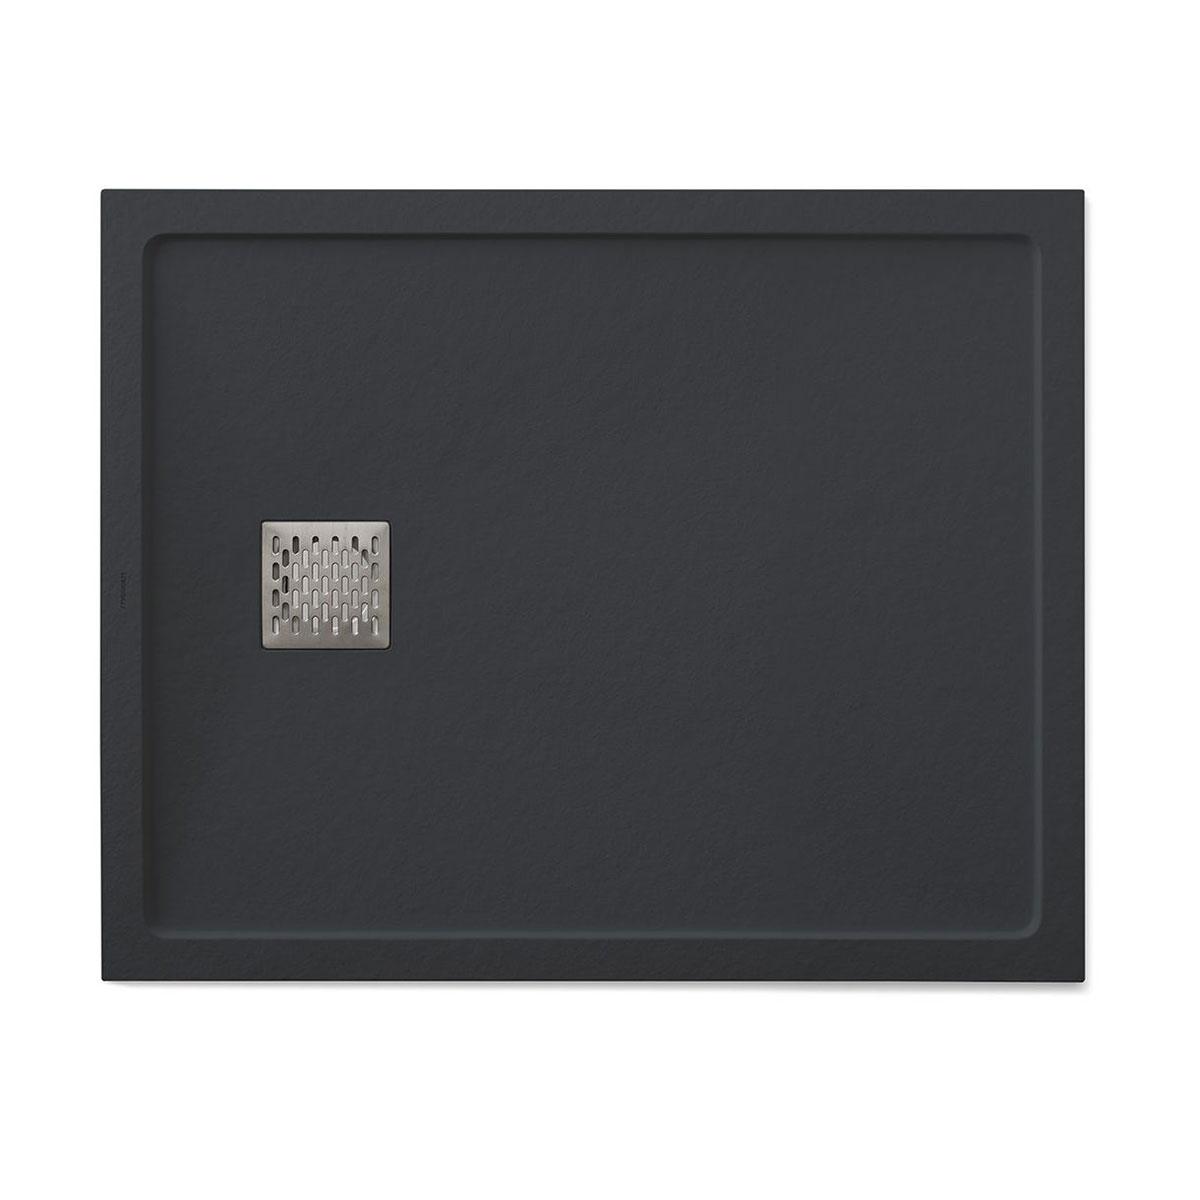 Plato de ducha rectangular 100x80 Ares Stone Nox Grafito